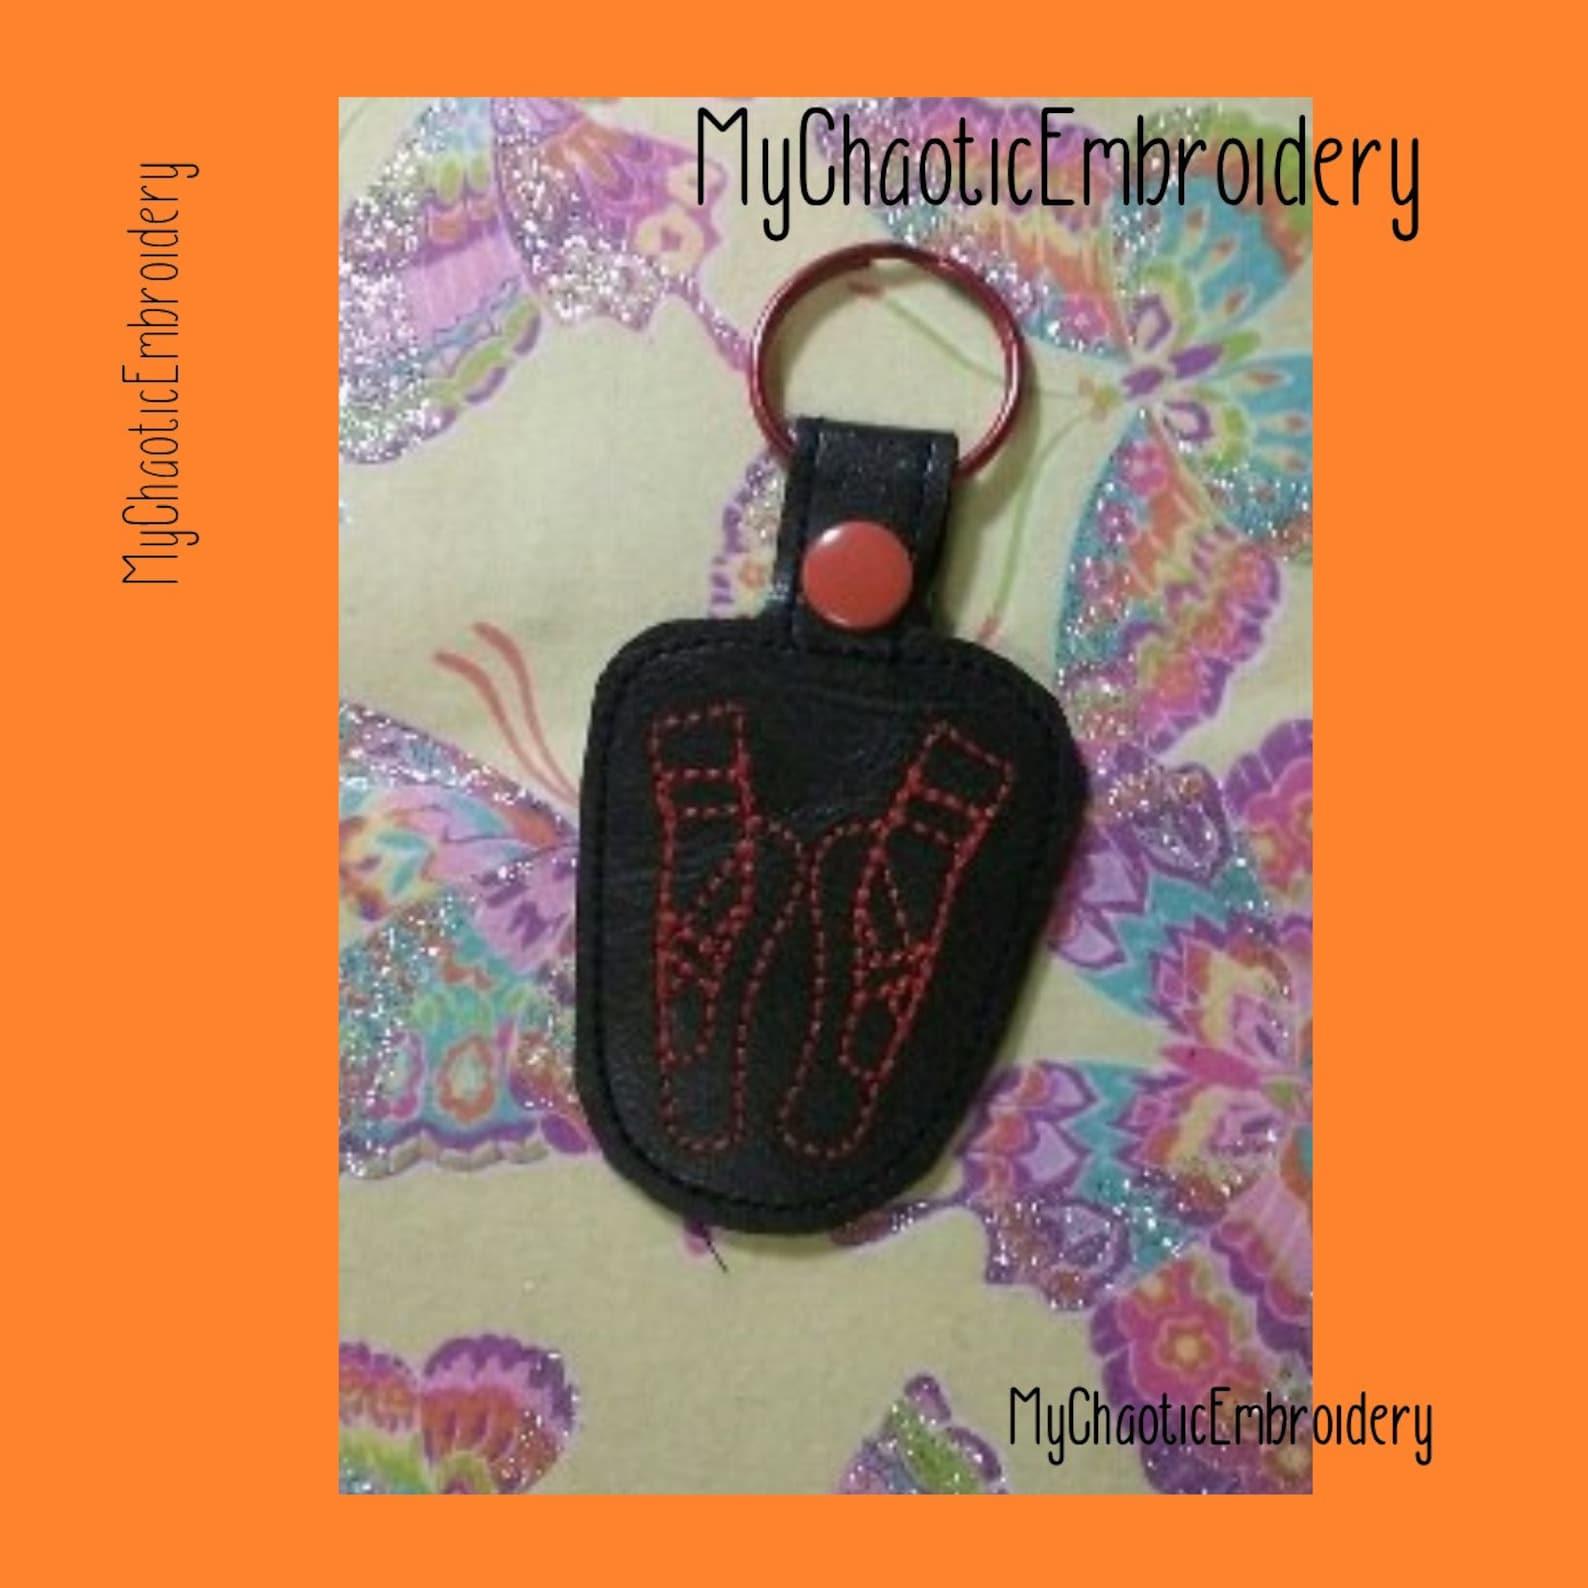 ballerina dancer ballet shoes 4x4 keyfob key fob ring designs - digital file machine embroidery design